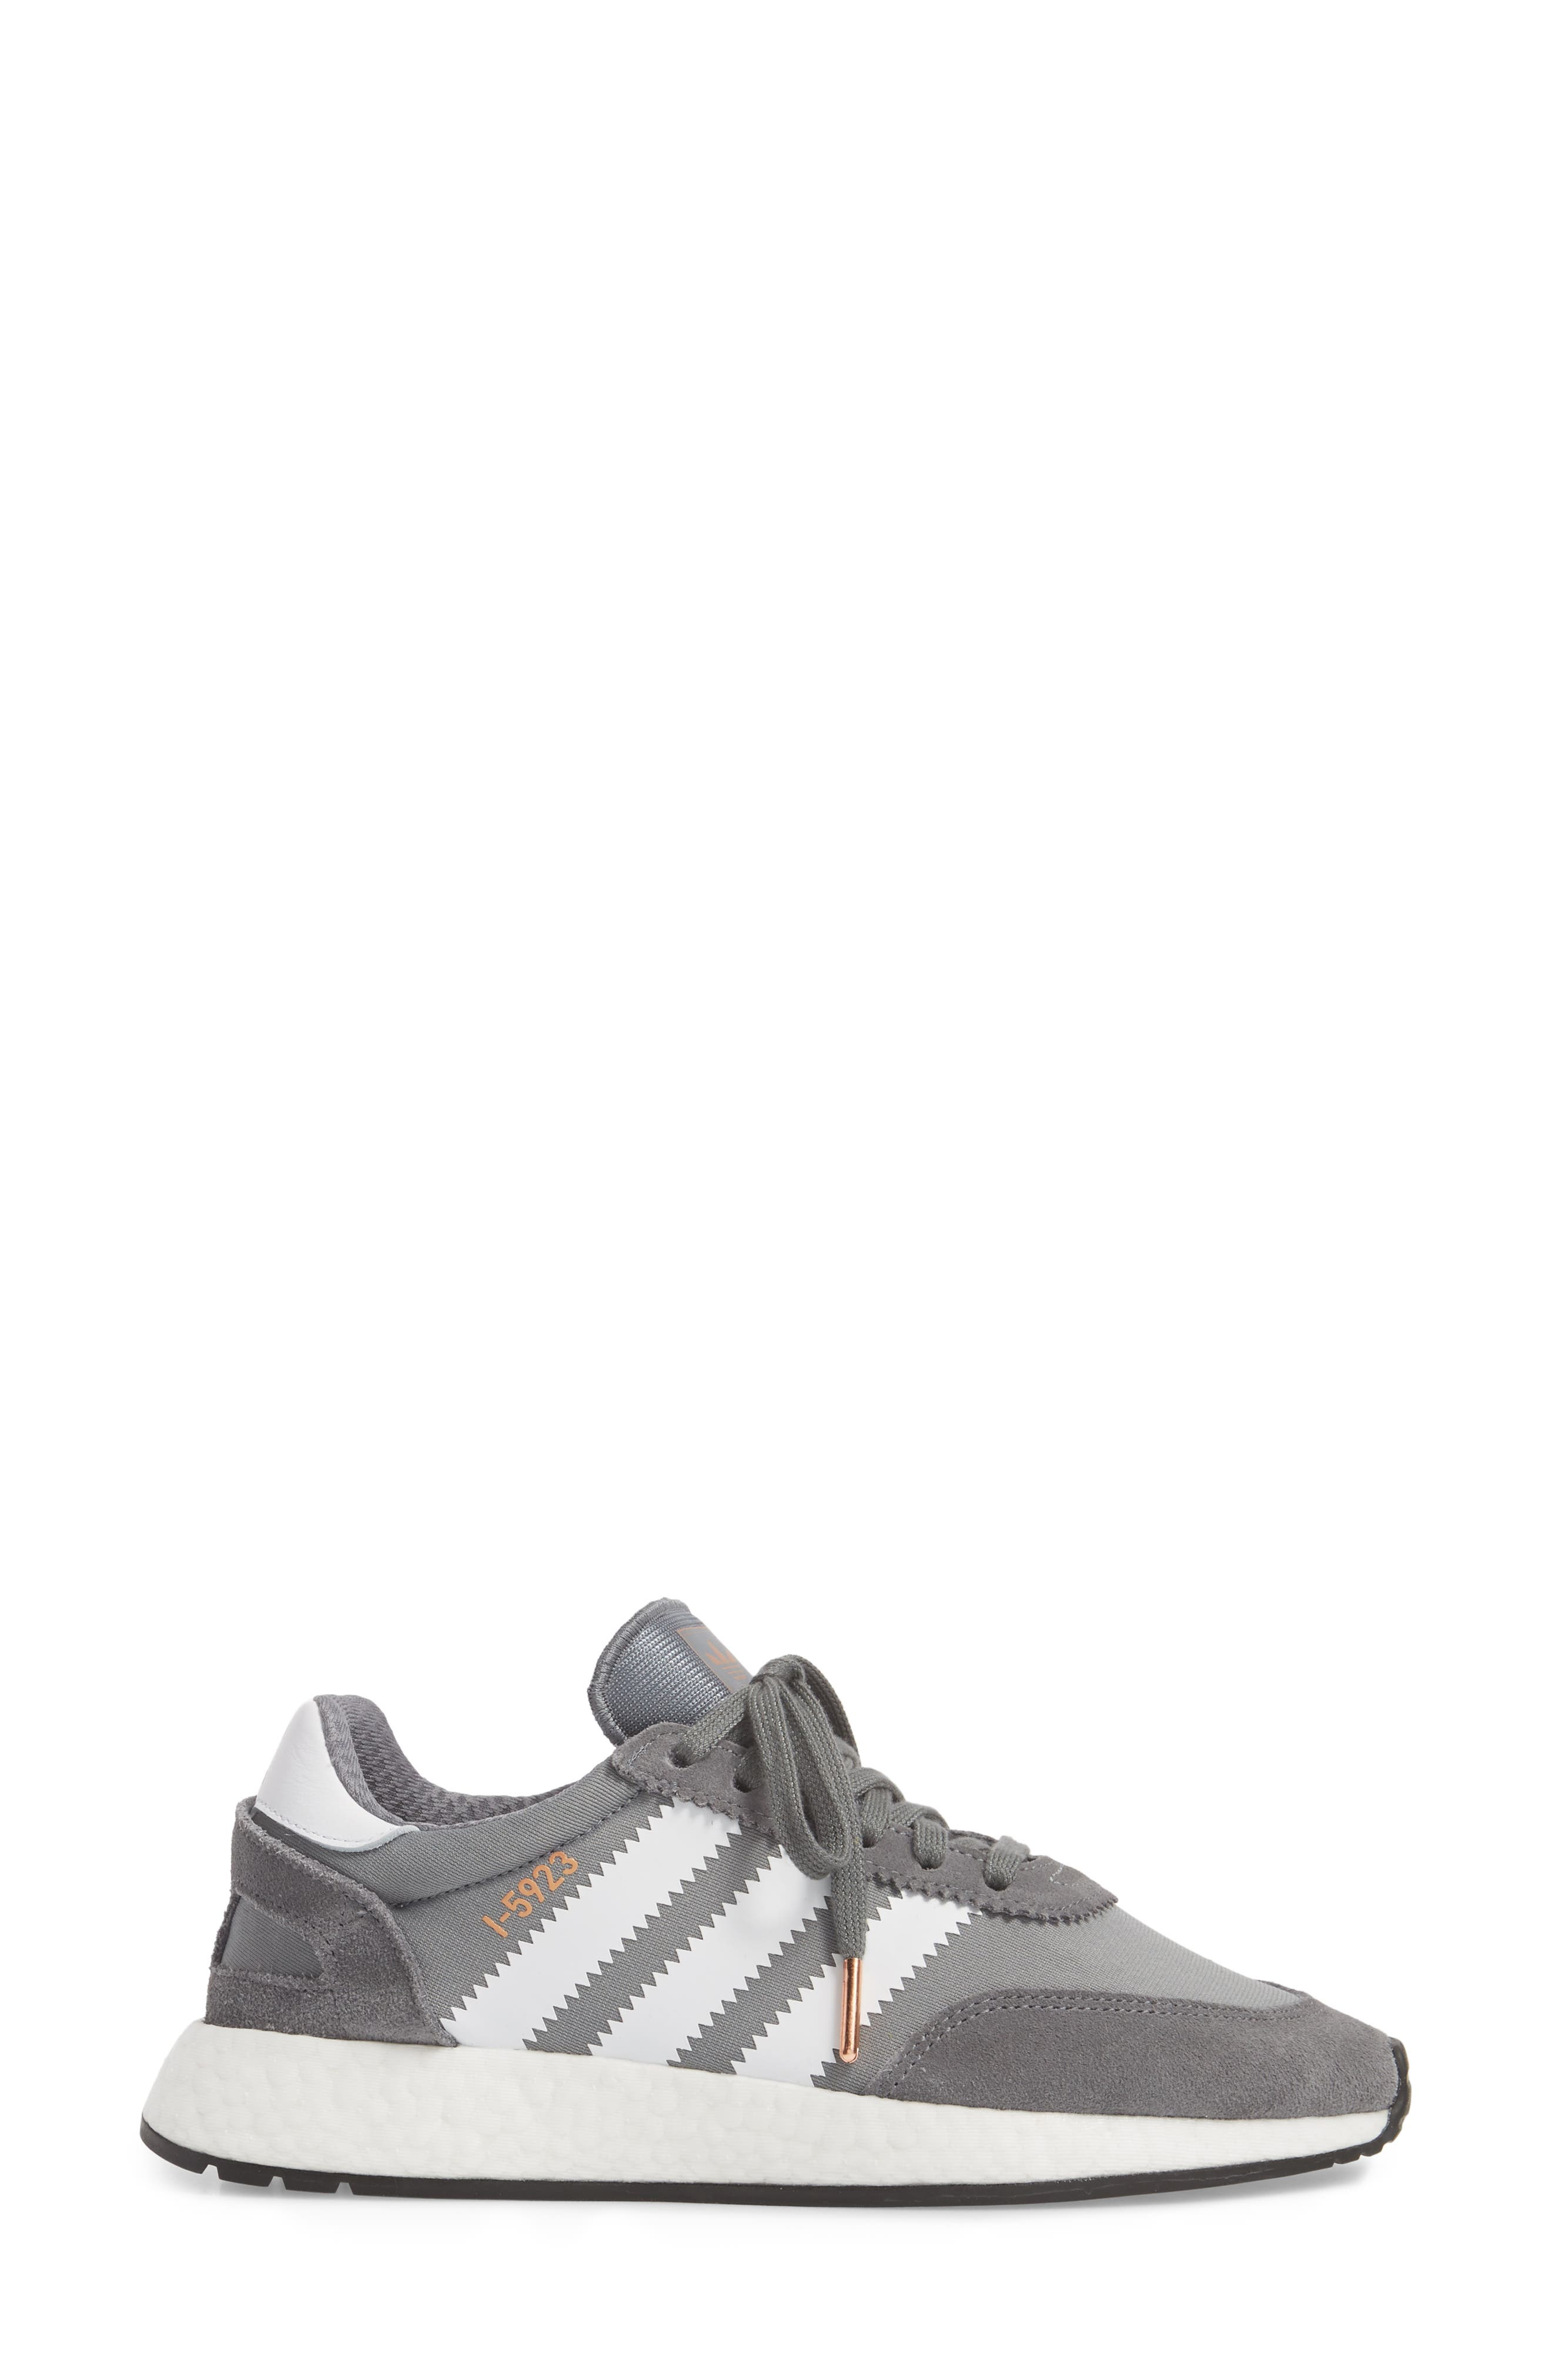 I-5923 Sneaker,                             Alternate thumbnail 3, color,                             Visible Grey/ White/ Black